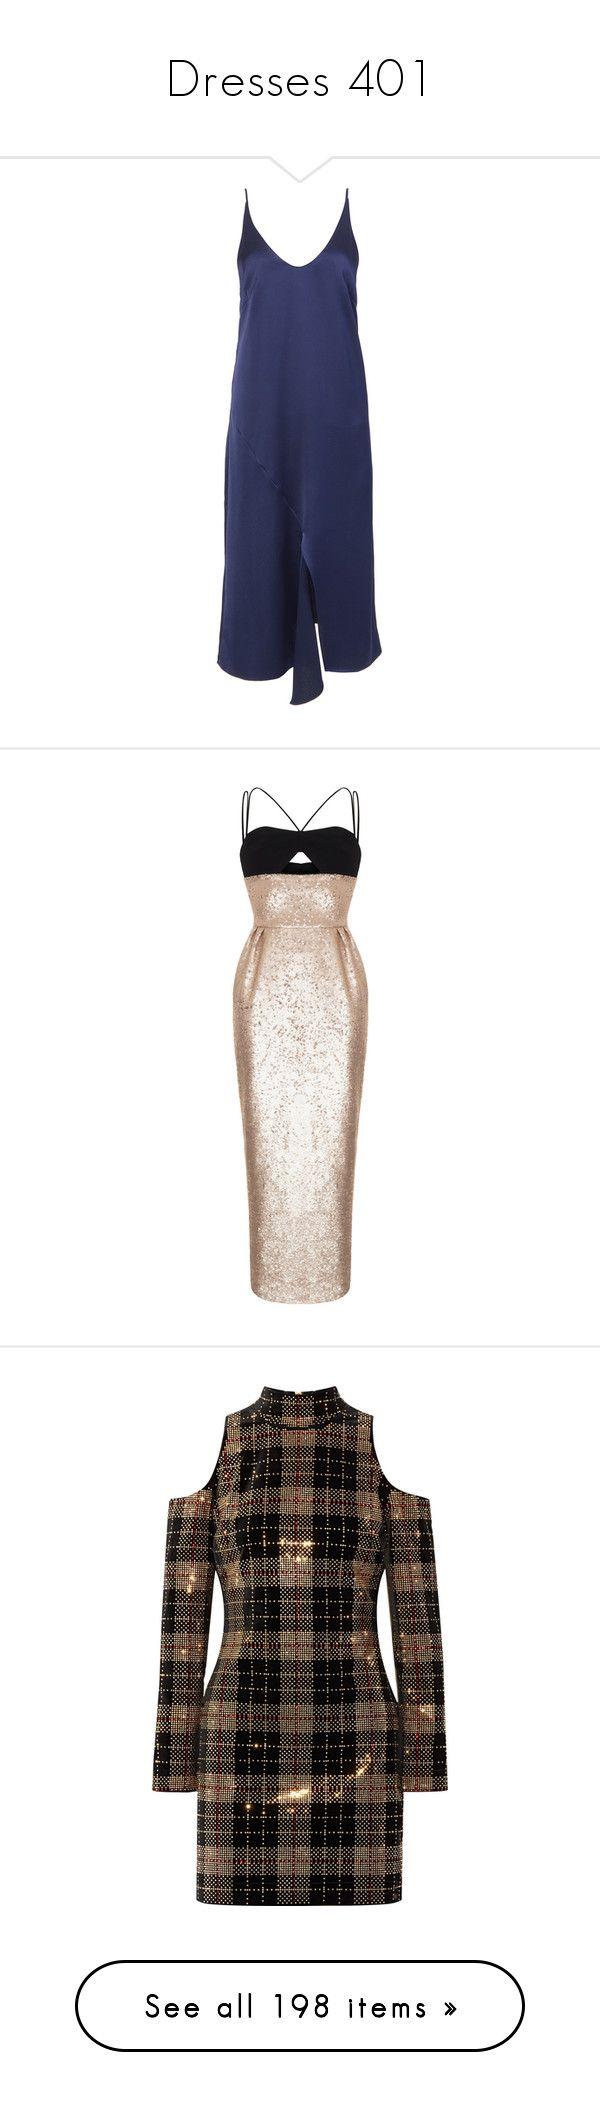 """Dresses 401"" by singlemom ❤ liked on Polyvore featuring dresses, front slit dress, blue color dress, tibi, satin dress, satin slip dresses, rasario, metallic, fitted waist dress and crepe dress"